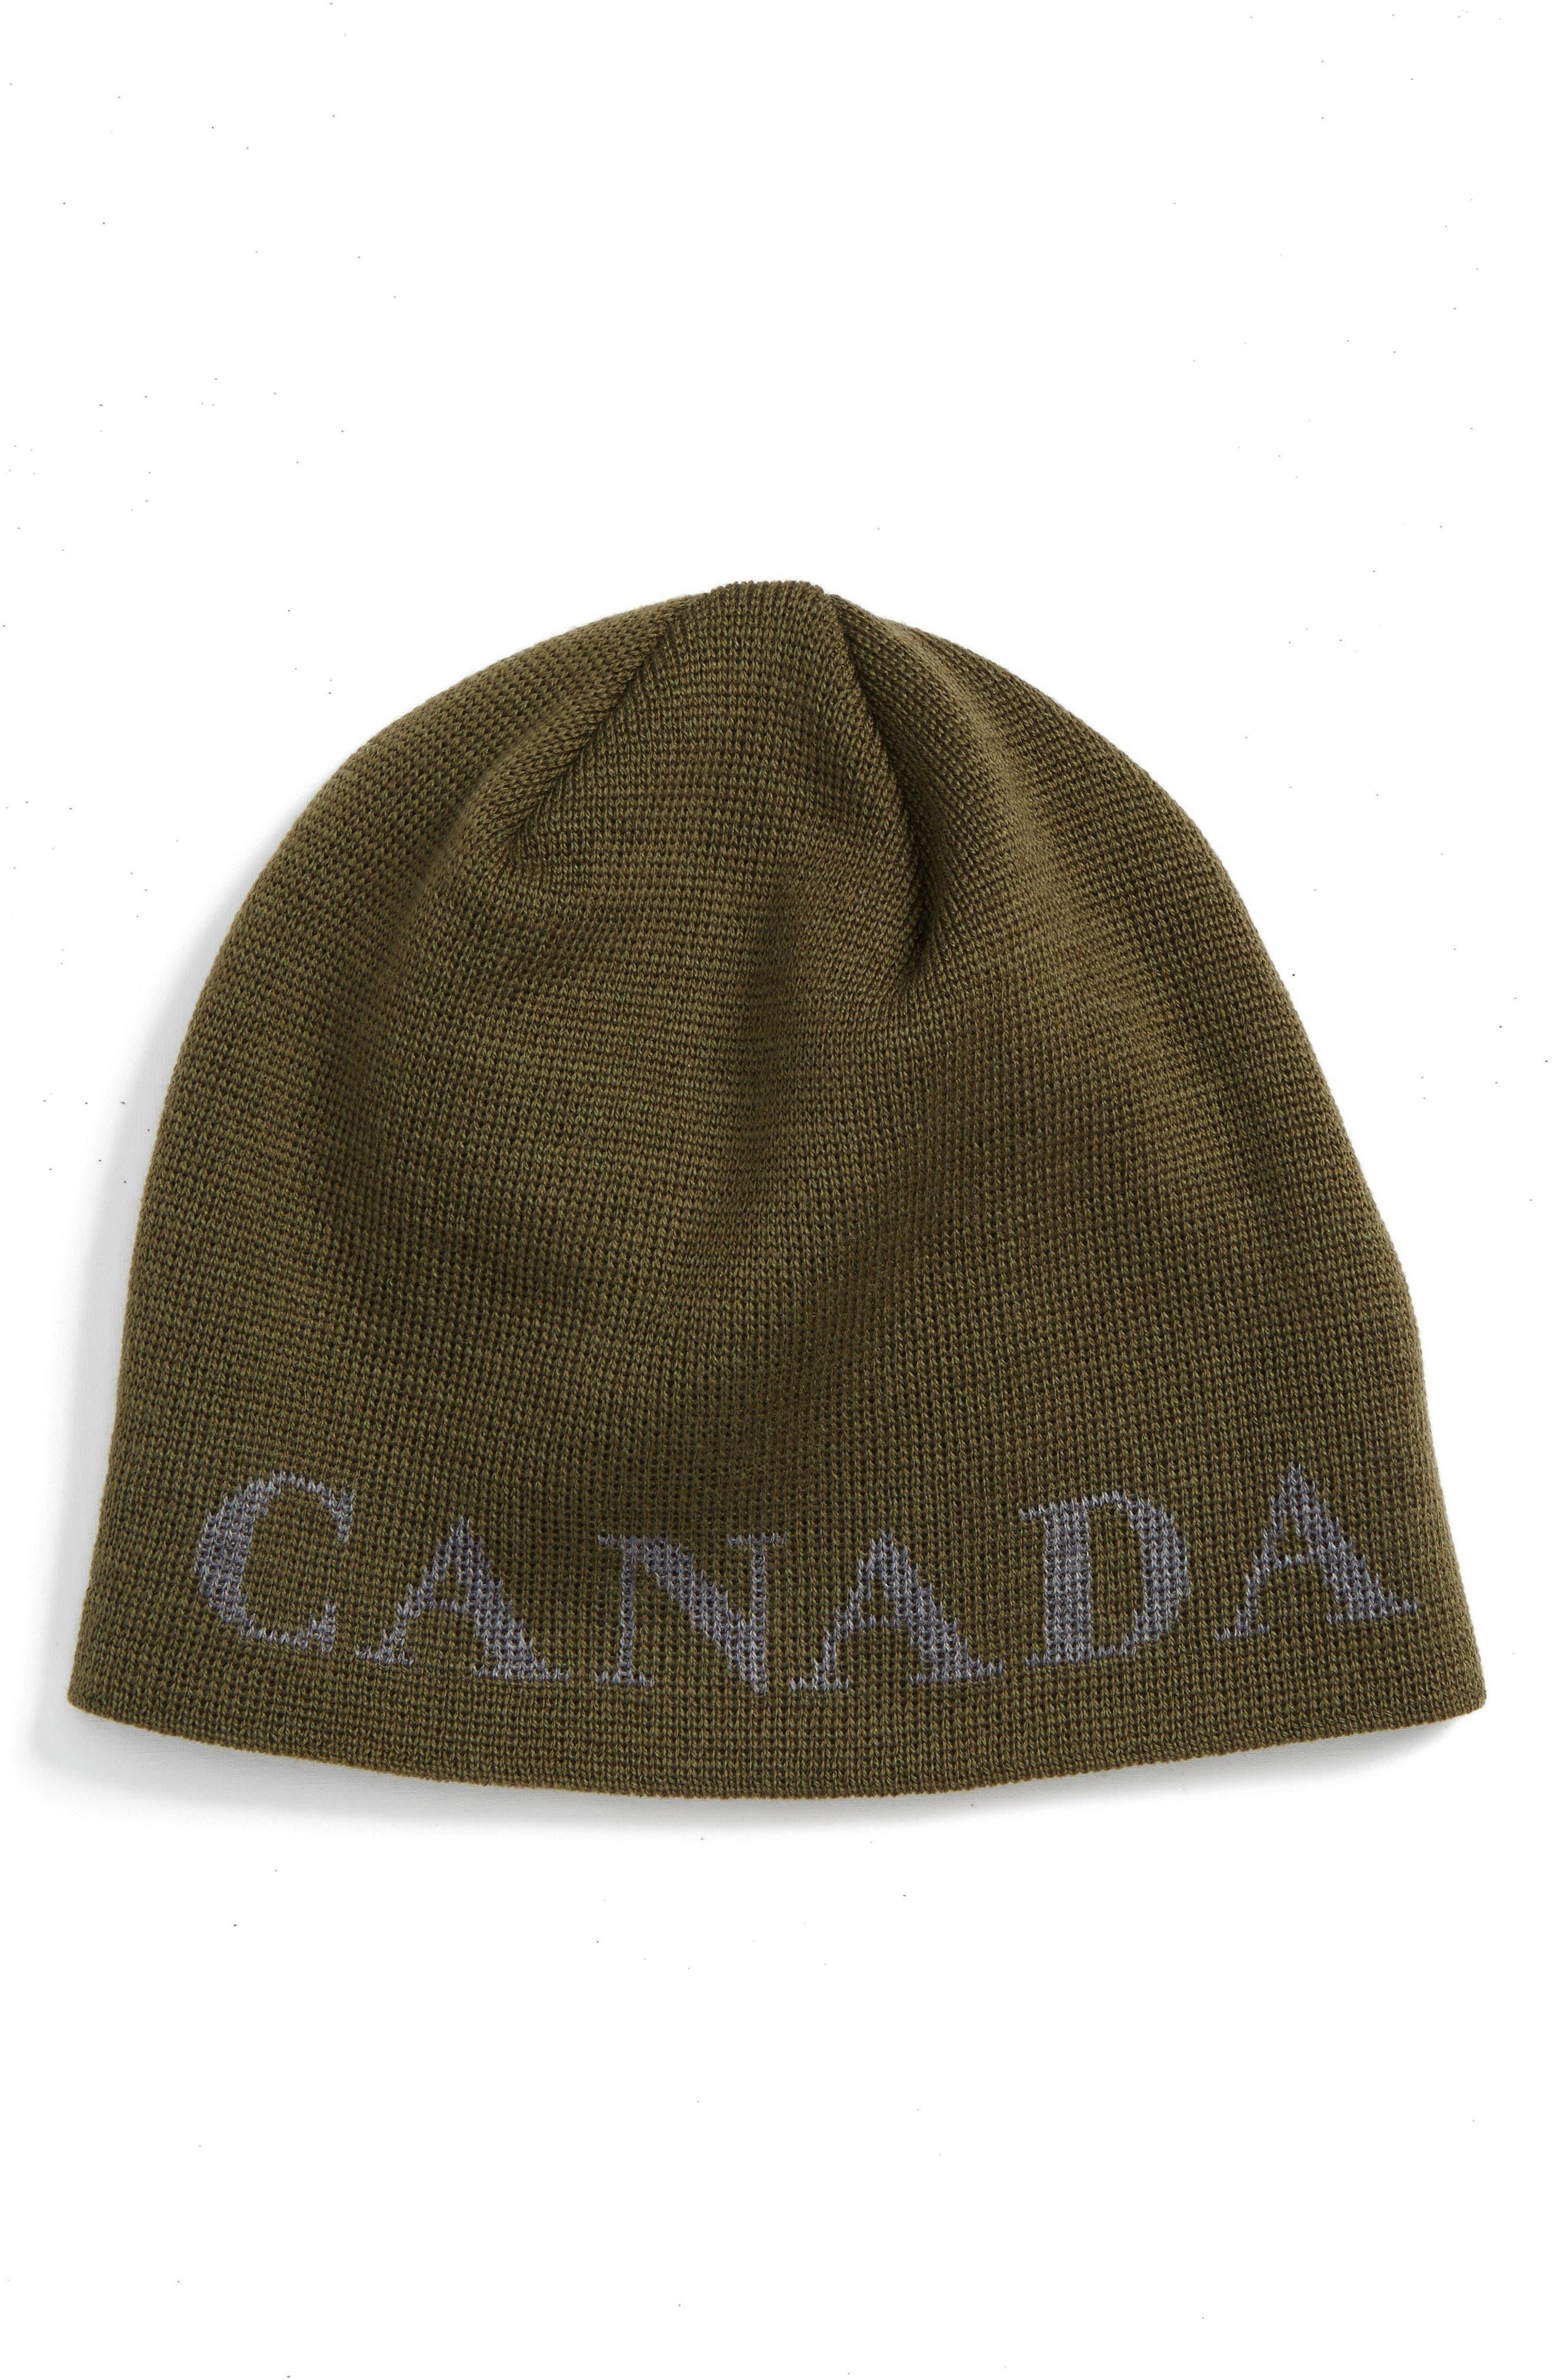 Canada Goose Boreal Beanie